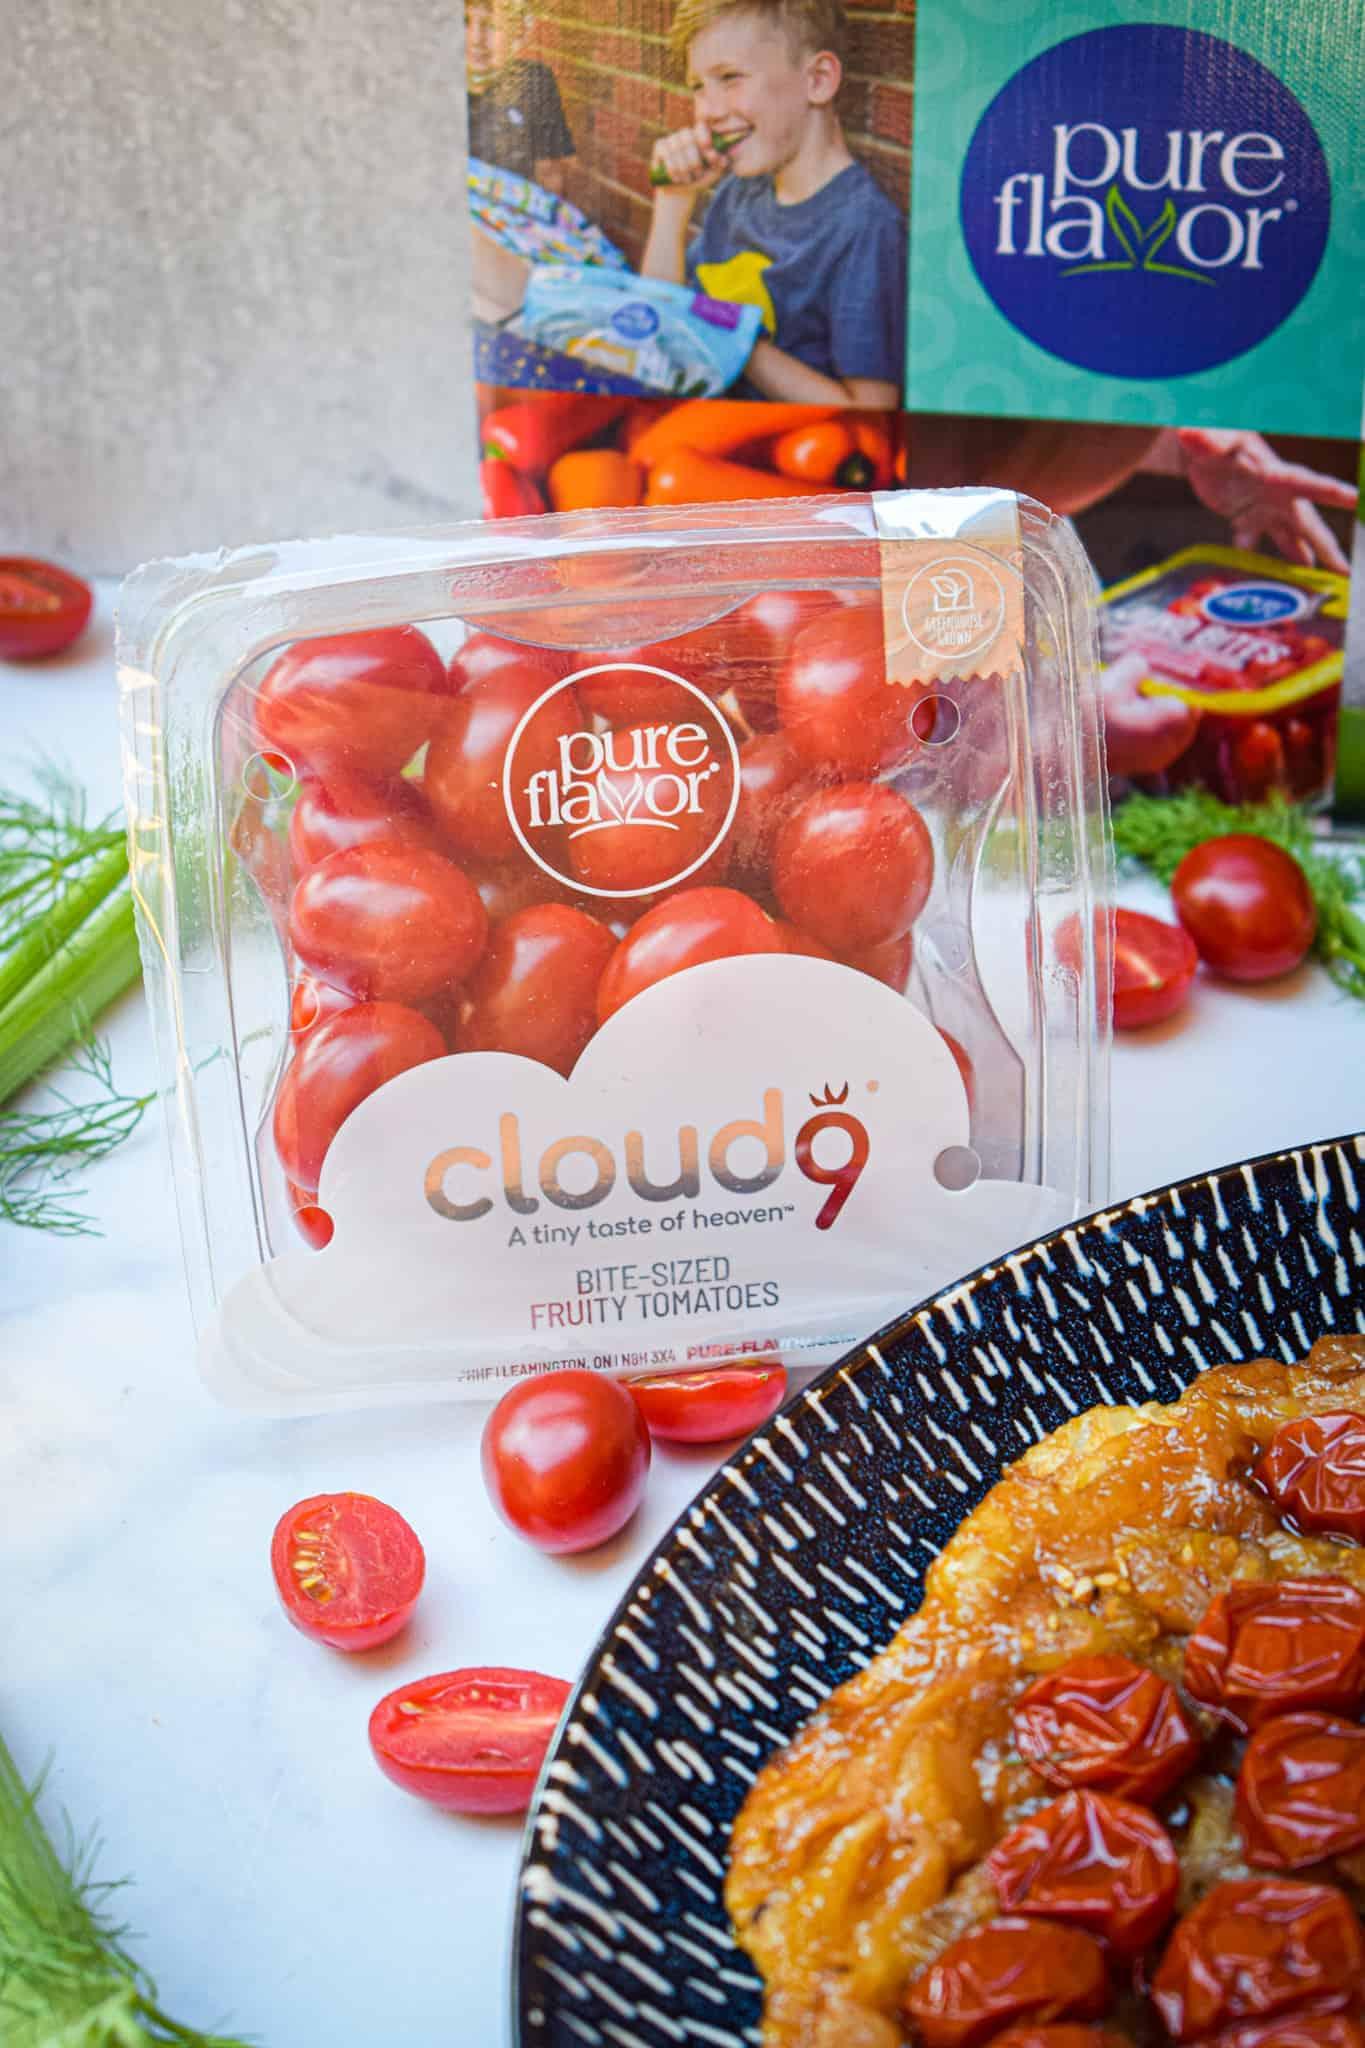 sweet tomato & fennel tarte tatin featuring cloud 9 fruity tomatoes